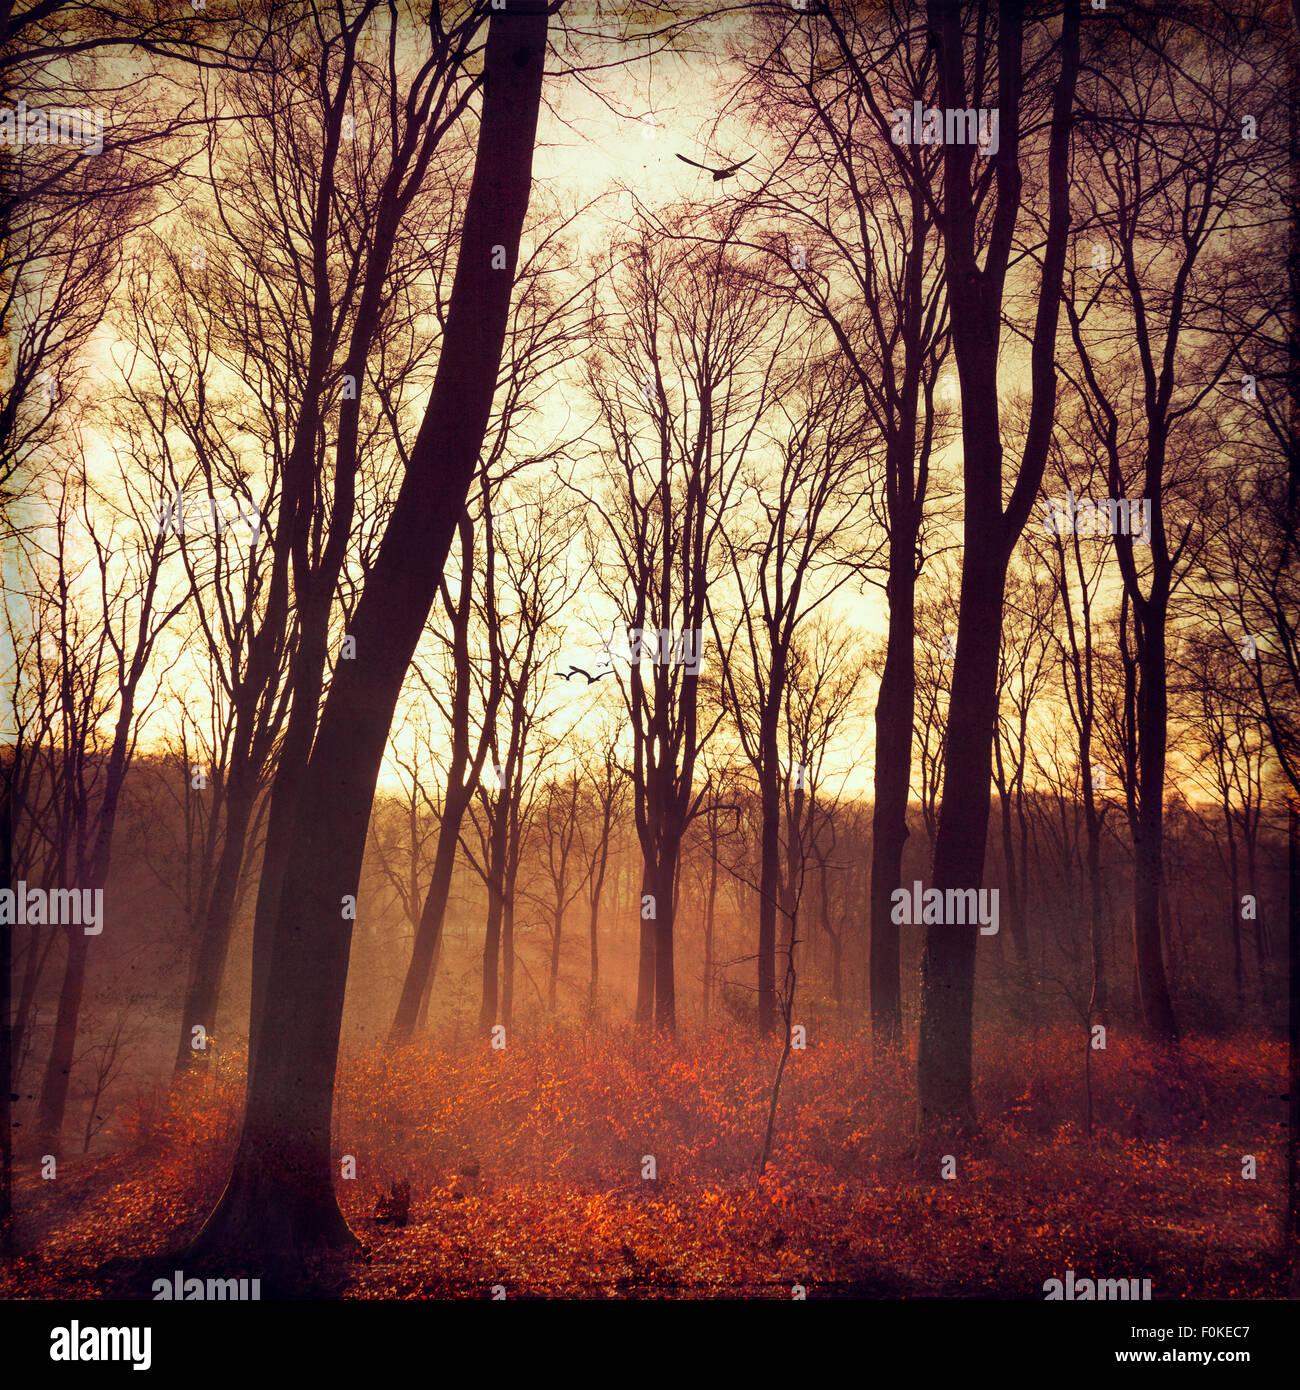 Autum forest at sunrise, digitally manipulated - Stock Image